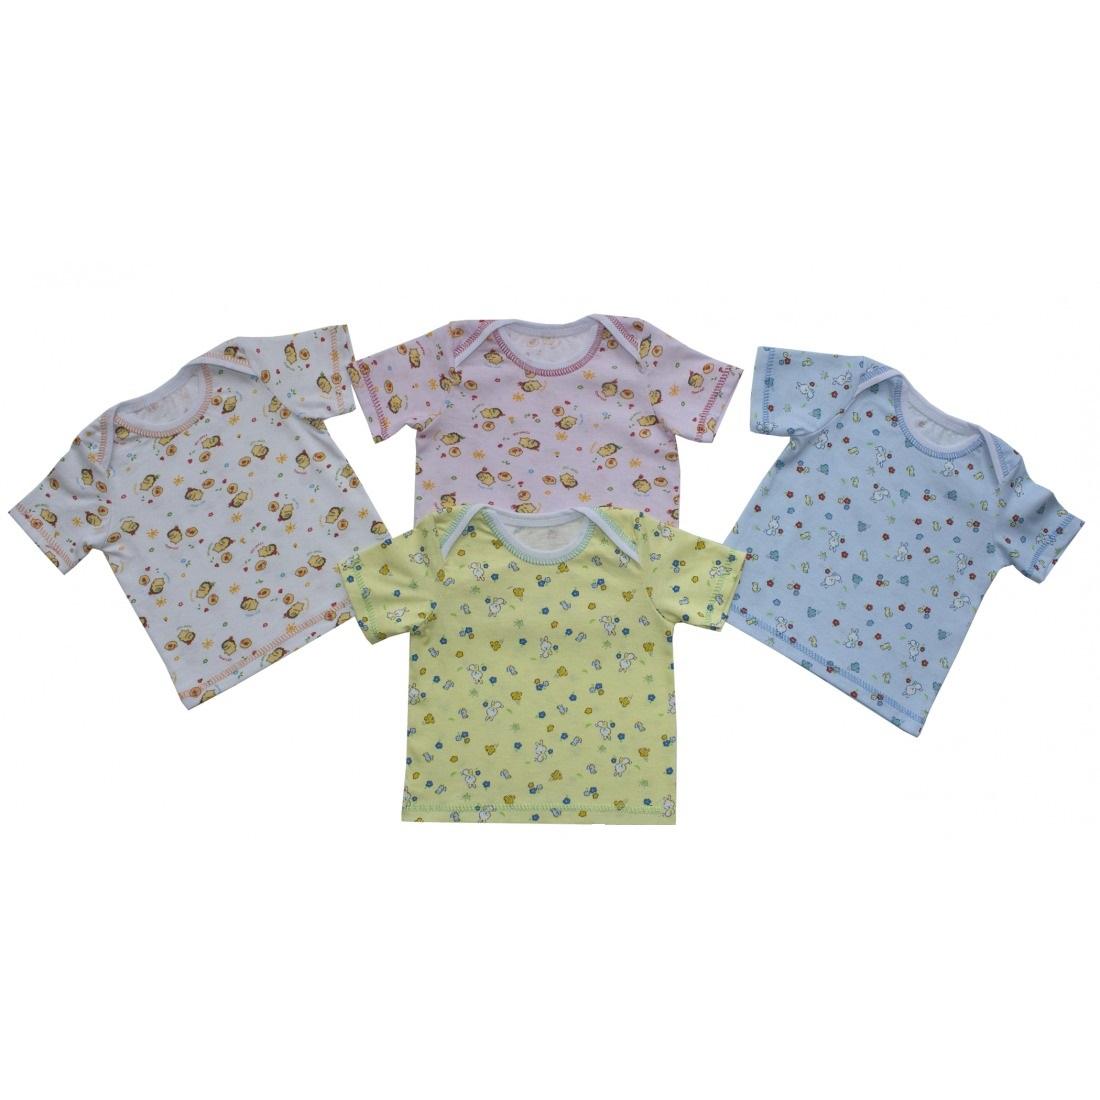 Фуфайка (футболка) детская ТоптыжкаМайки и футболки<br><br><br>Размер: Рост 74 (размер 24)